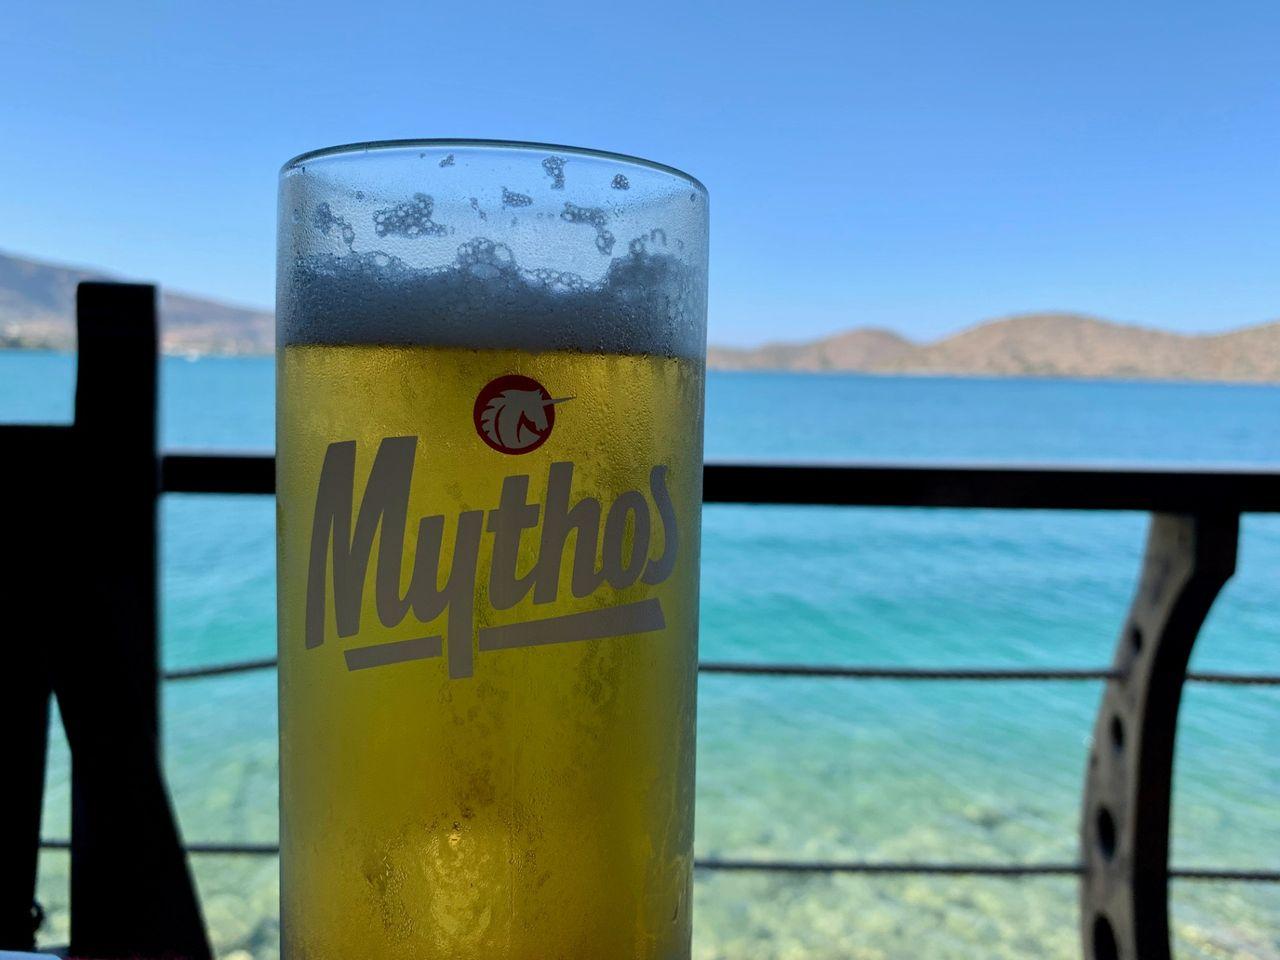 A local Mythos beer